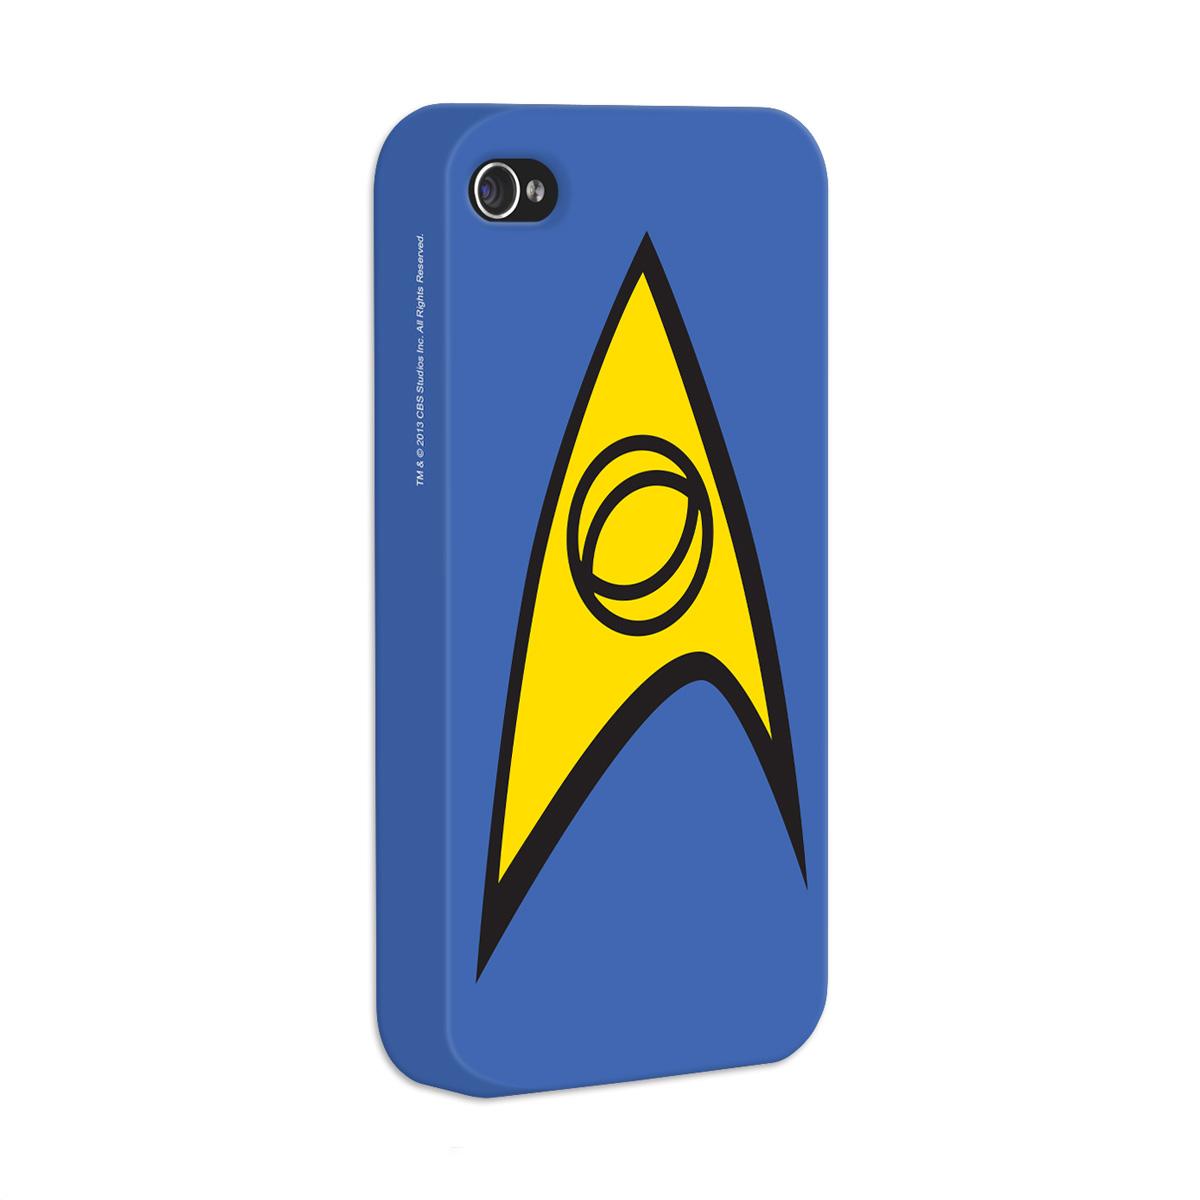 Capa de iPhone 4/4S Star Trek Command  Blue